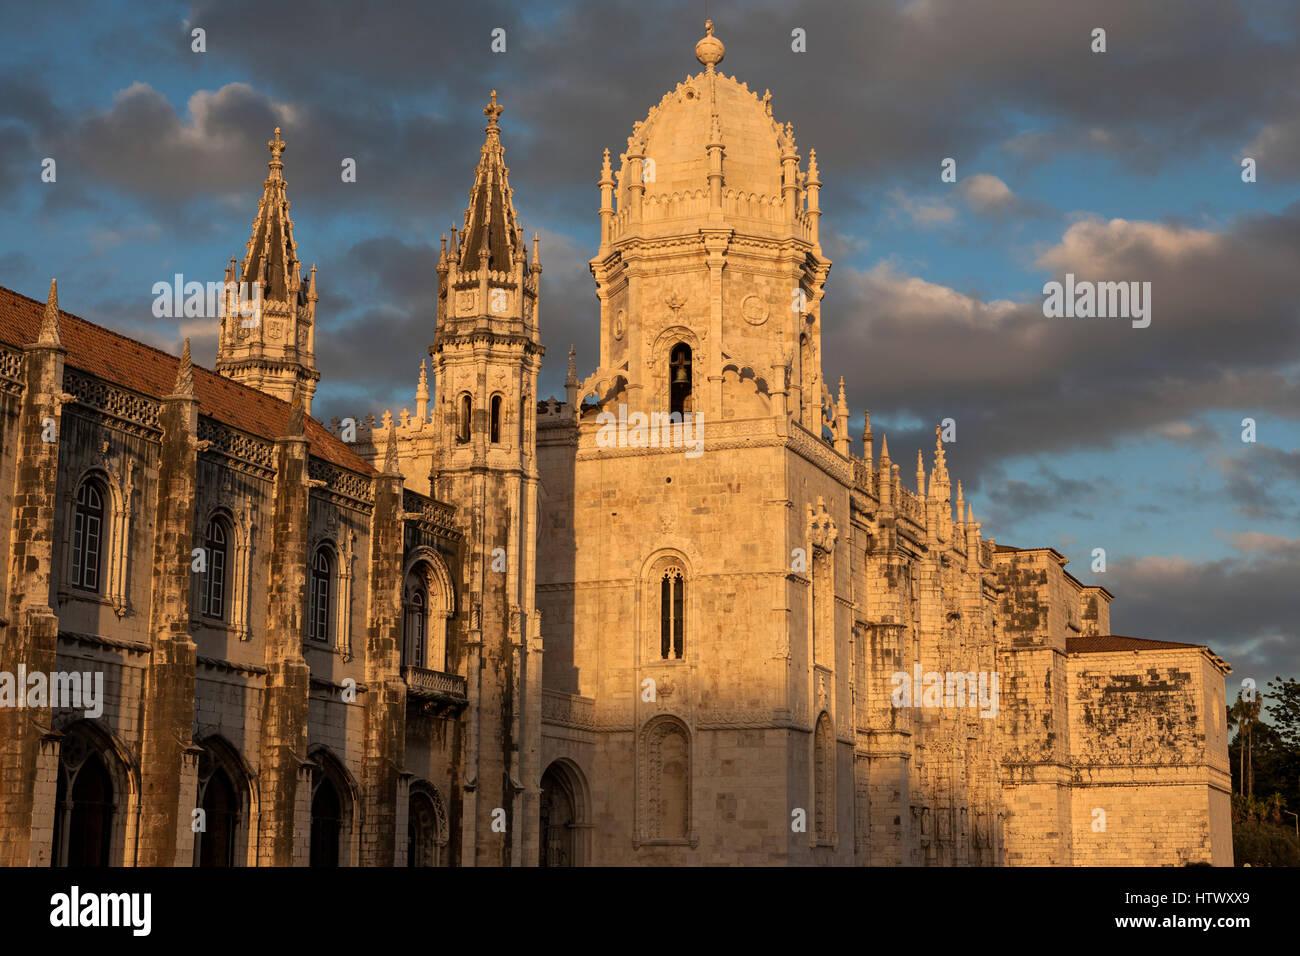 Igreja Santa Maria de Belém (The Church of St. Mary of Belém), Belém, Lisbon, Portugal - Stock Image